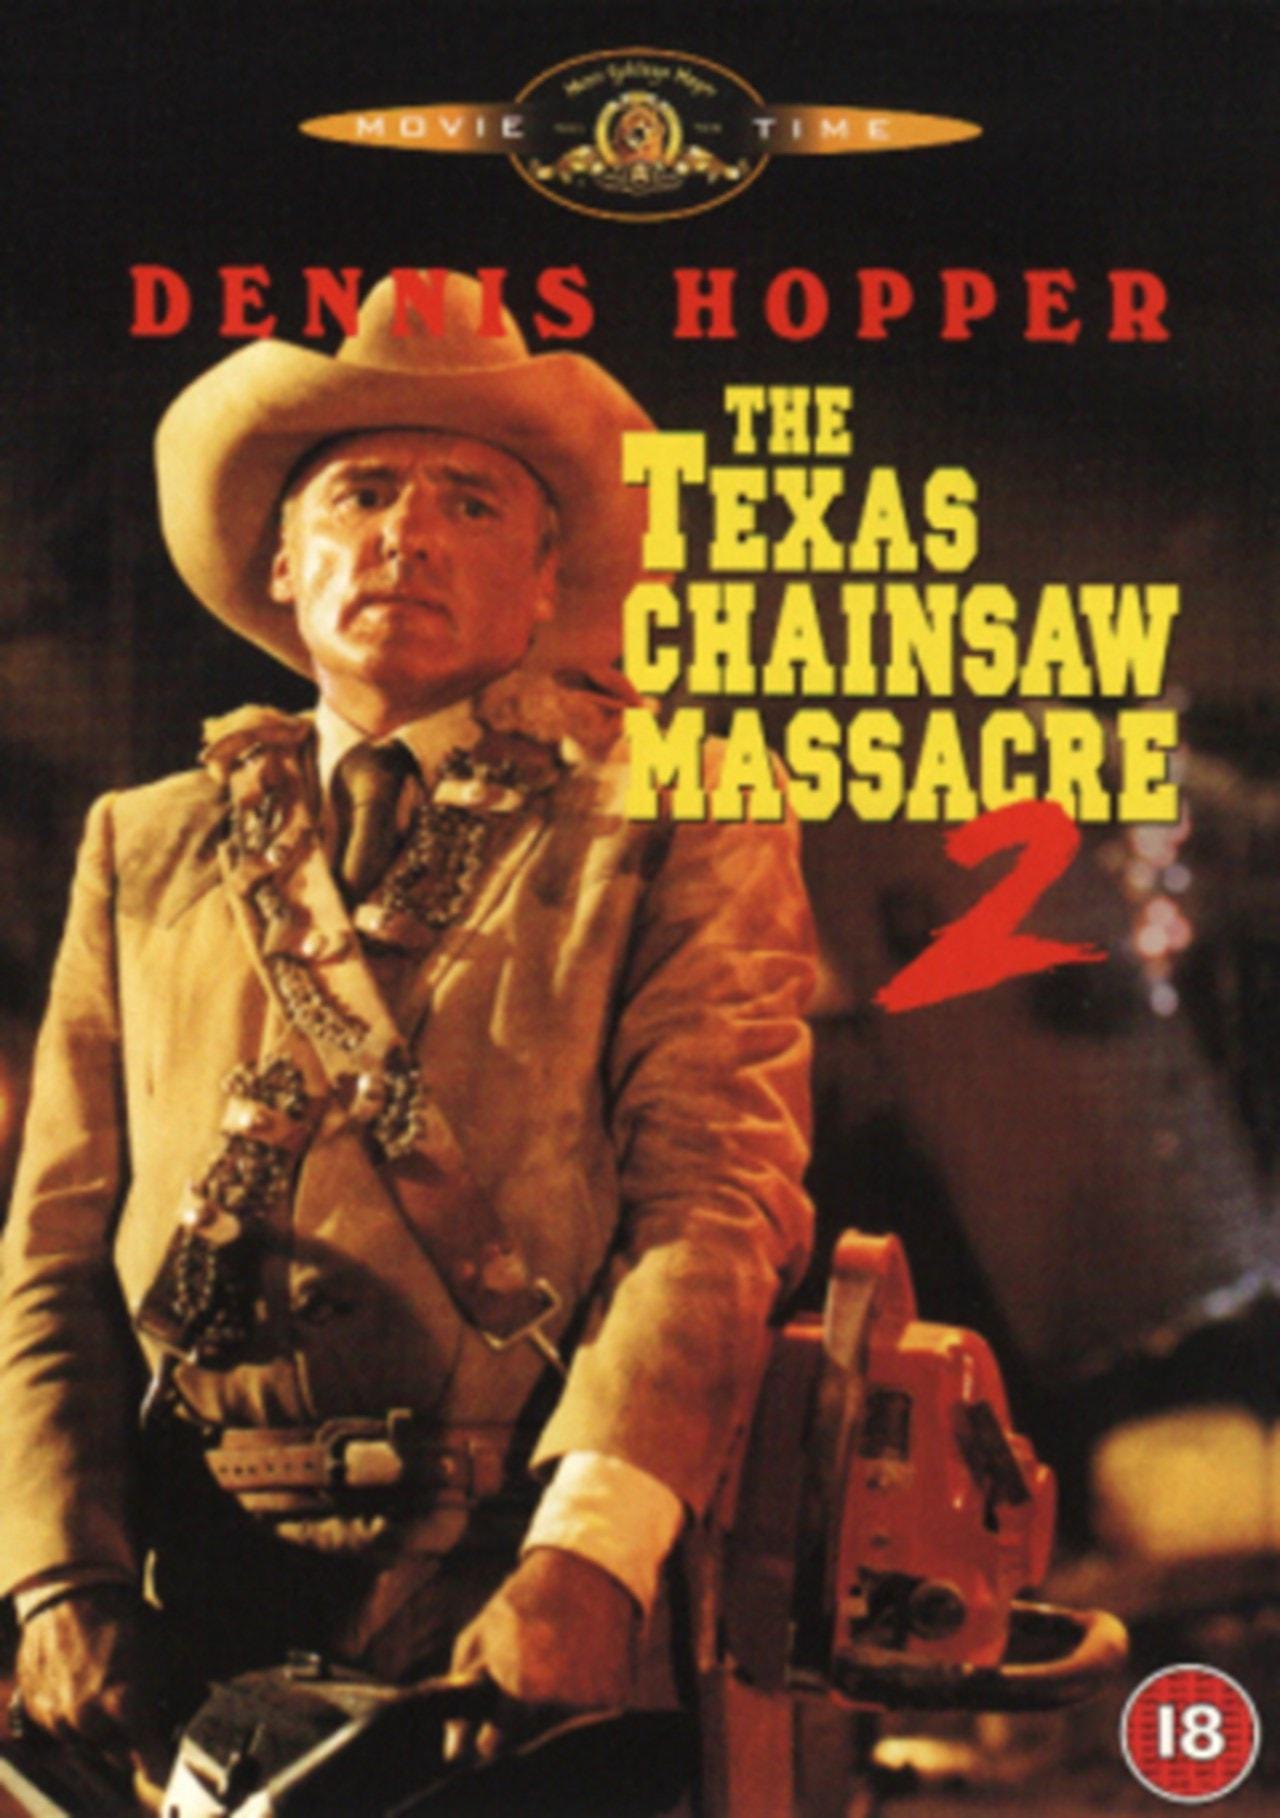 The Texas Chainsaw Massacre 2 - 1